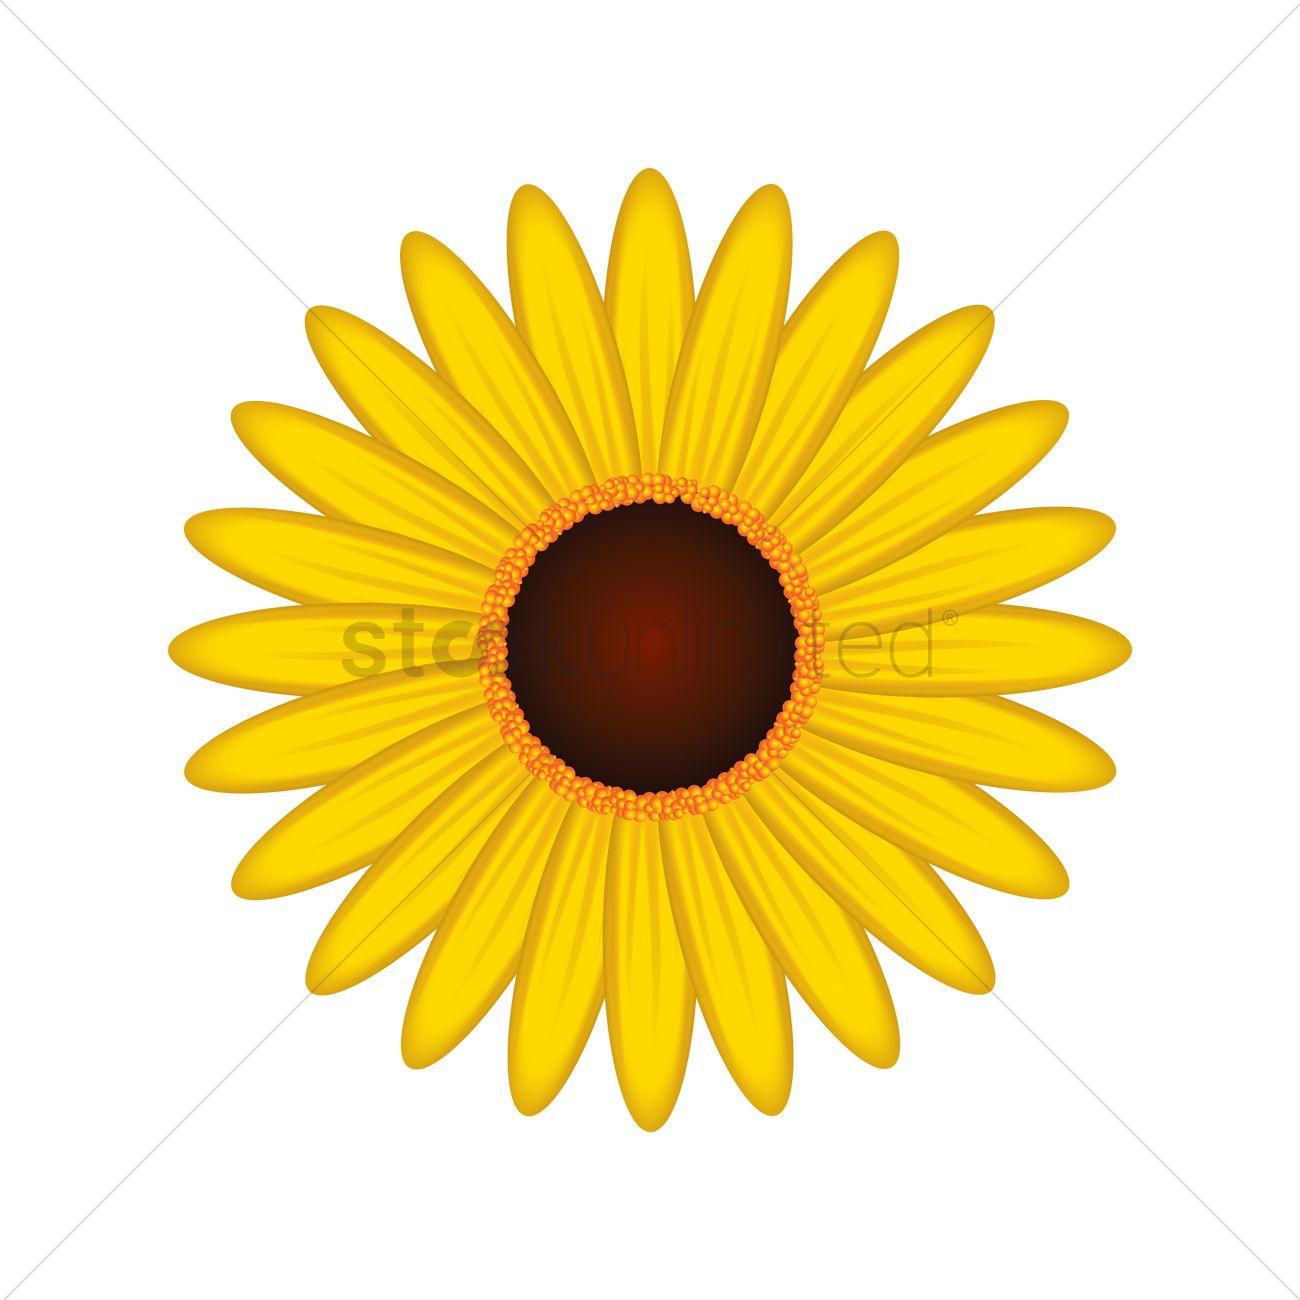 sunflower vector image 1997863 stockunlimited rh stockunlimited com sunflower vector free sunflower vector logo